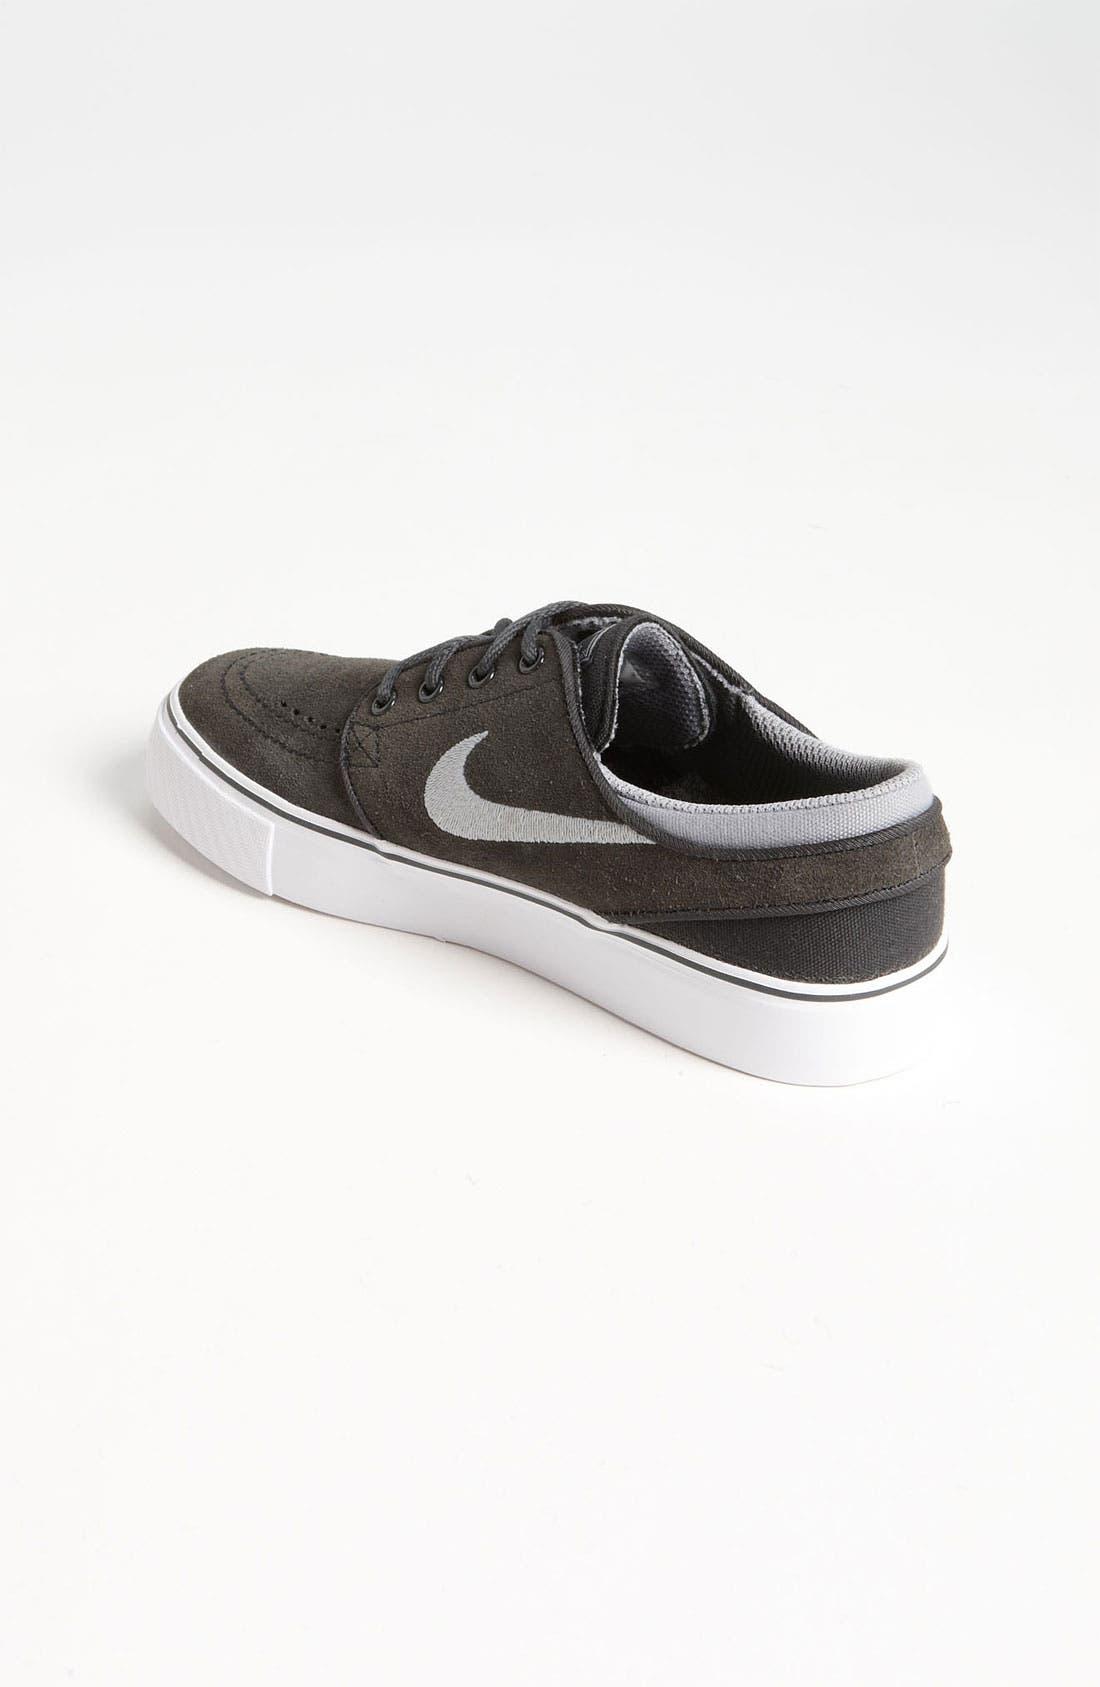 'Stefan Janoski' Sneaker,                             Alternate thumbnail 2, color,                             Anthracite/ Grey